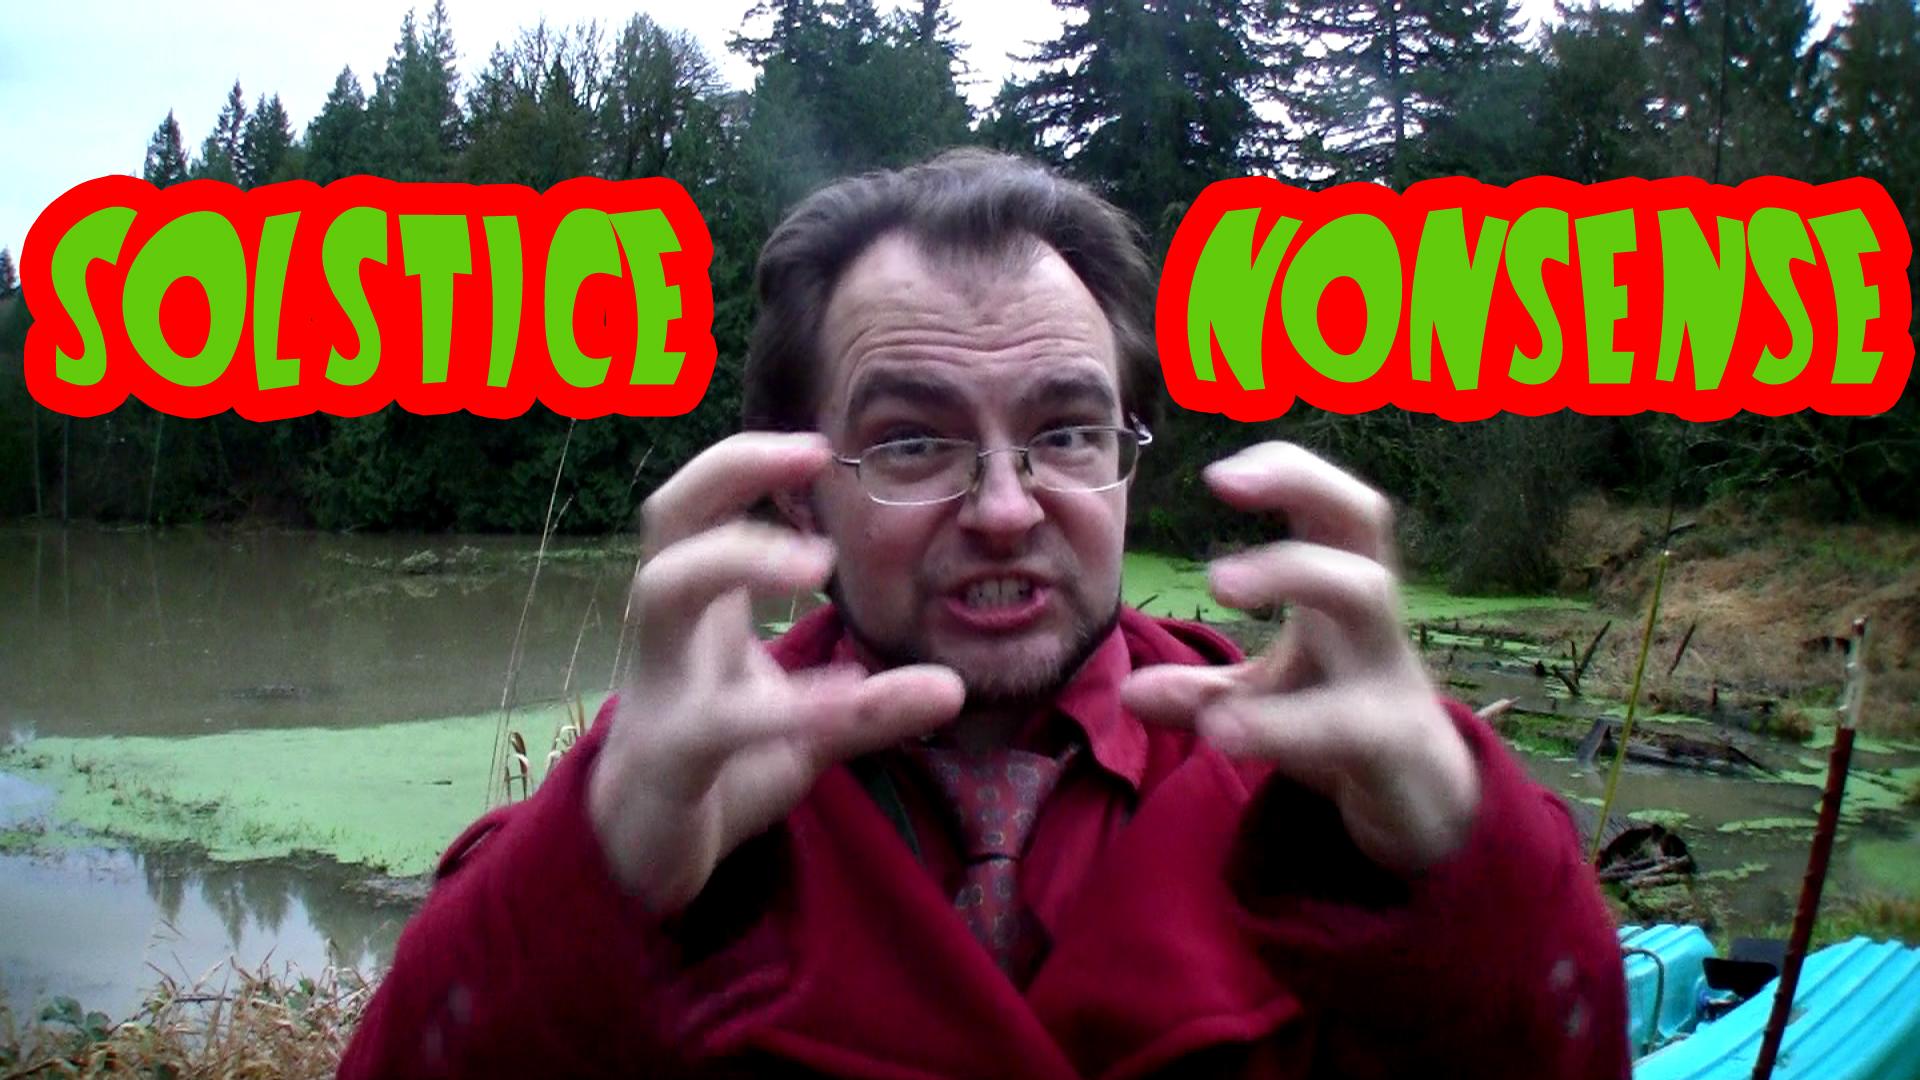 2014-12-21 Solstice Nonsense